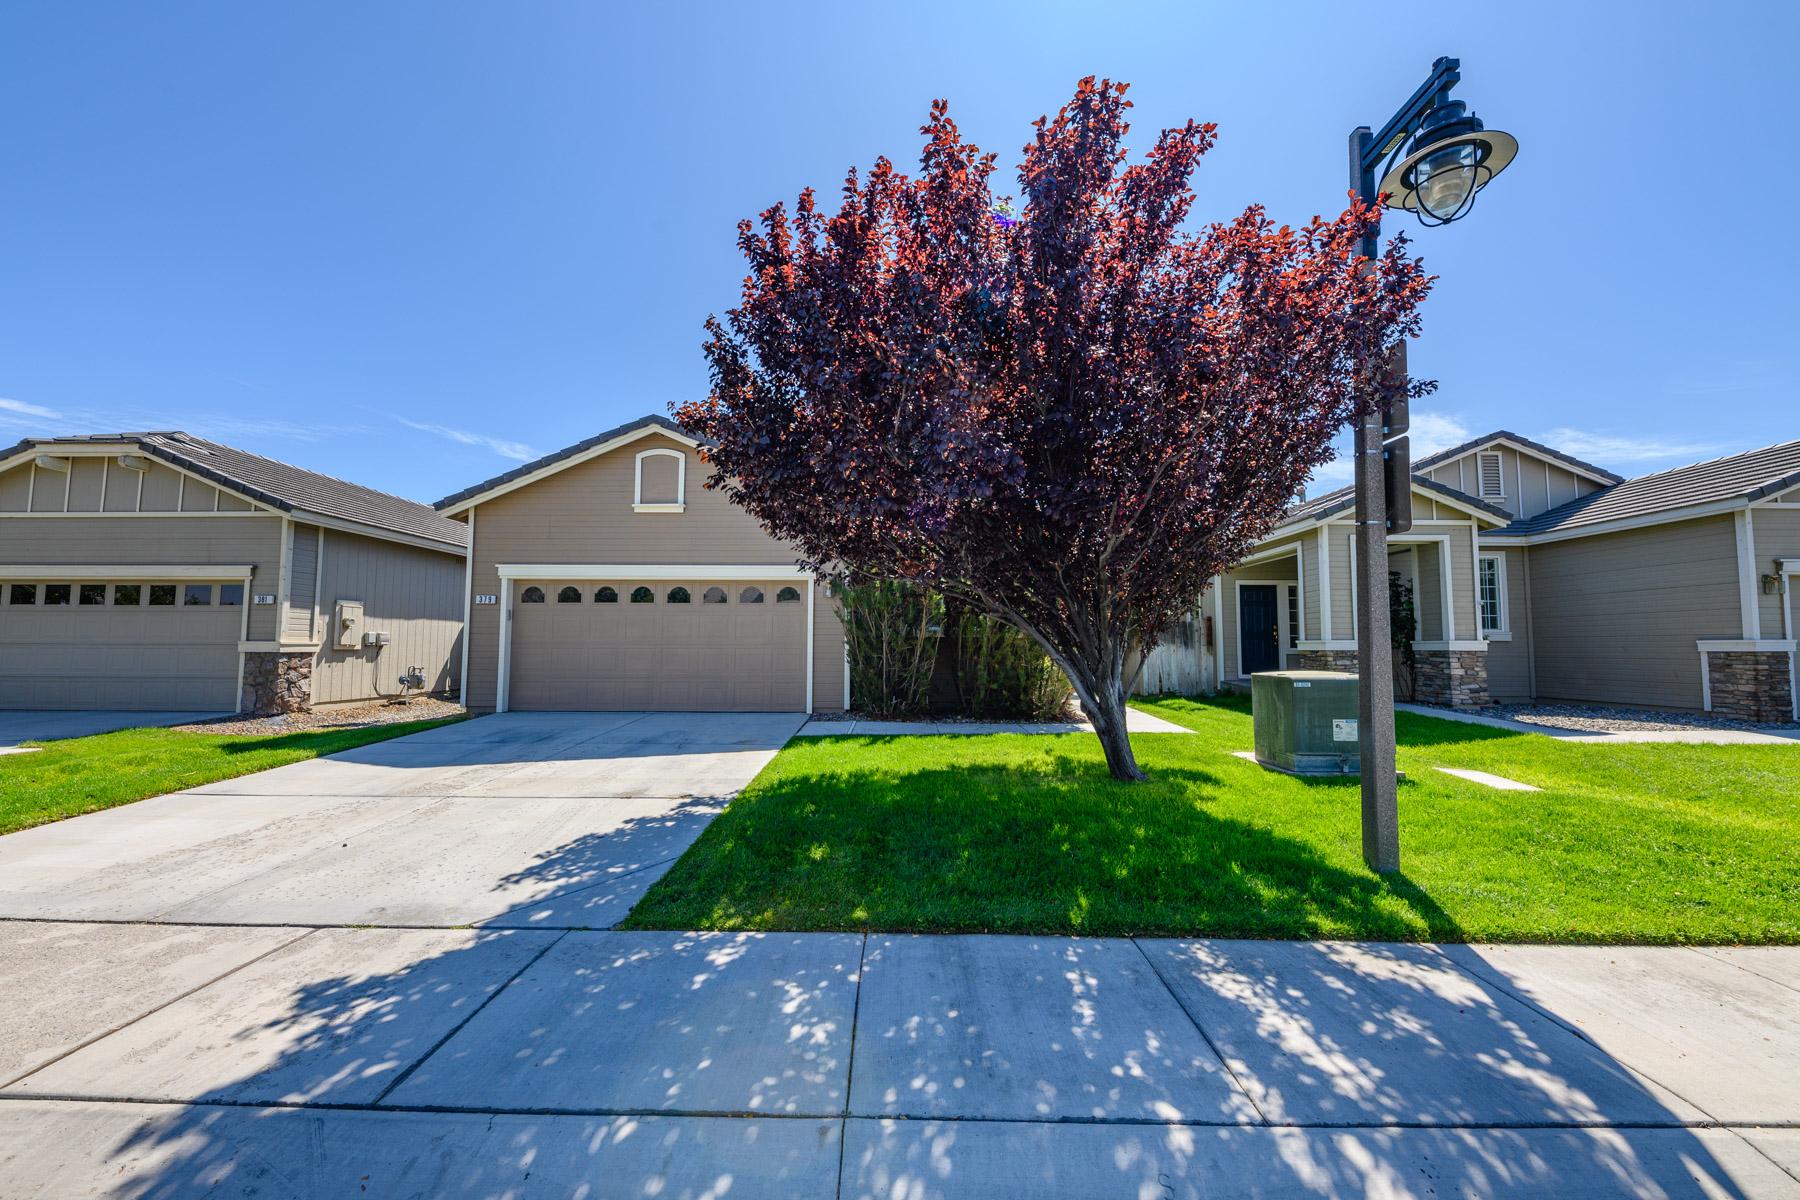 Additional photo for property listing at 379 Royal Troon Drive, Dayton, Nevada 379 Royal Troon Drive Dayton, Nevada 89403 Estados Unidos